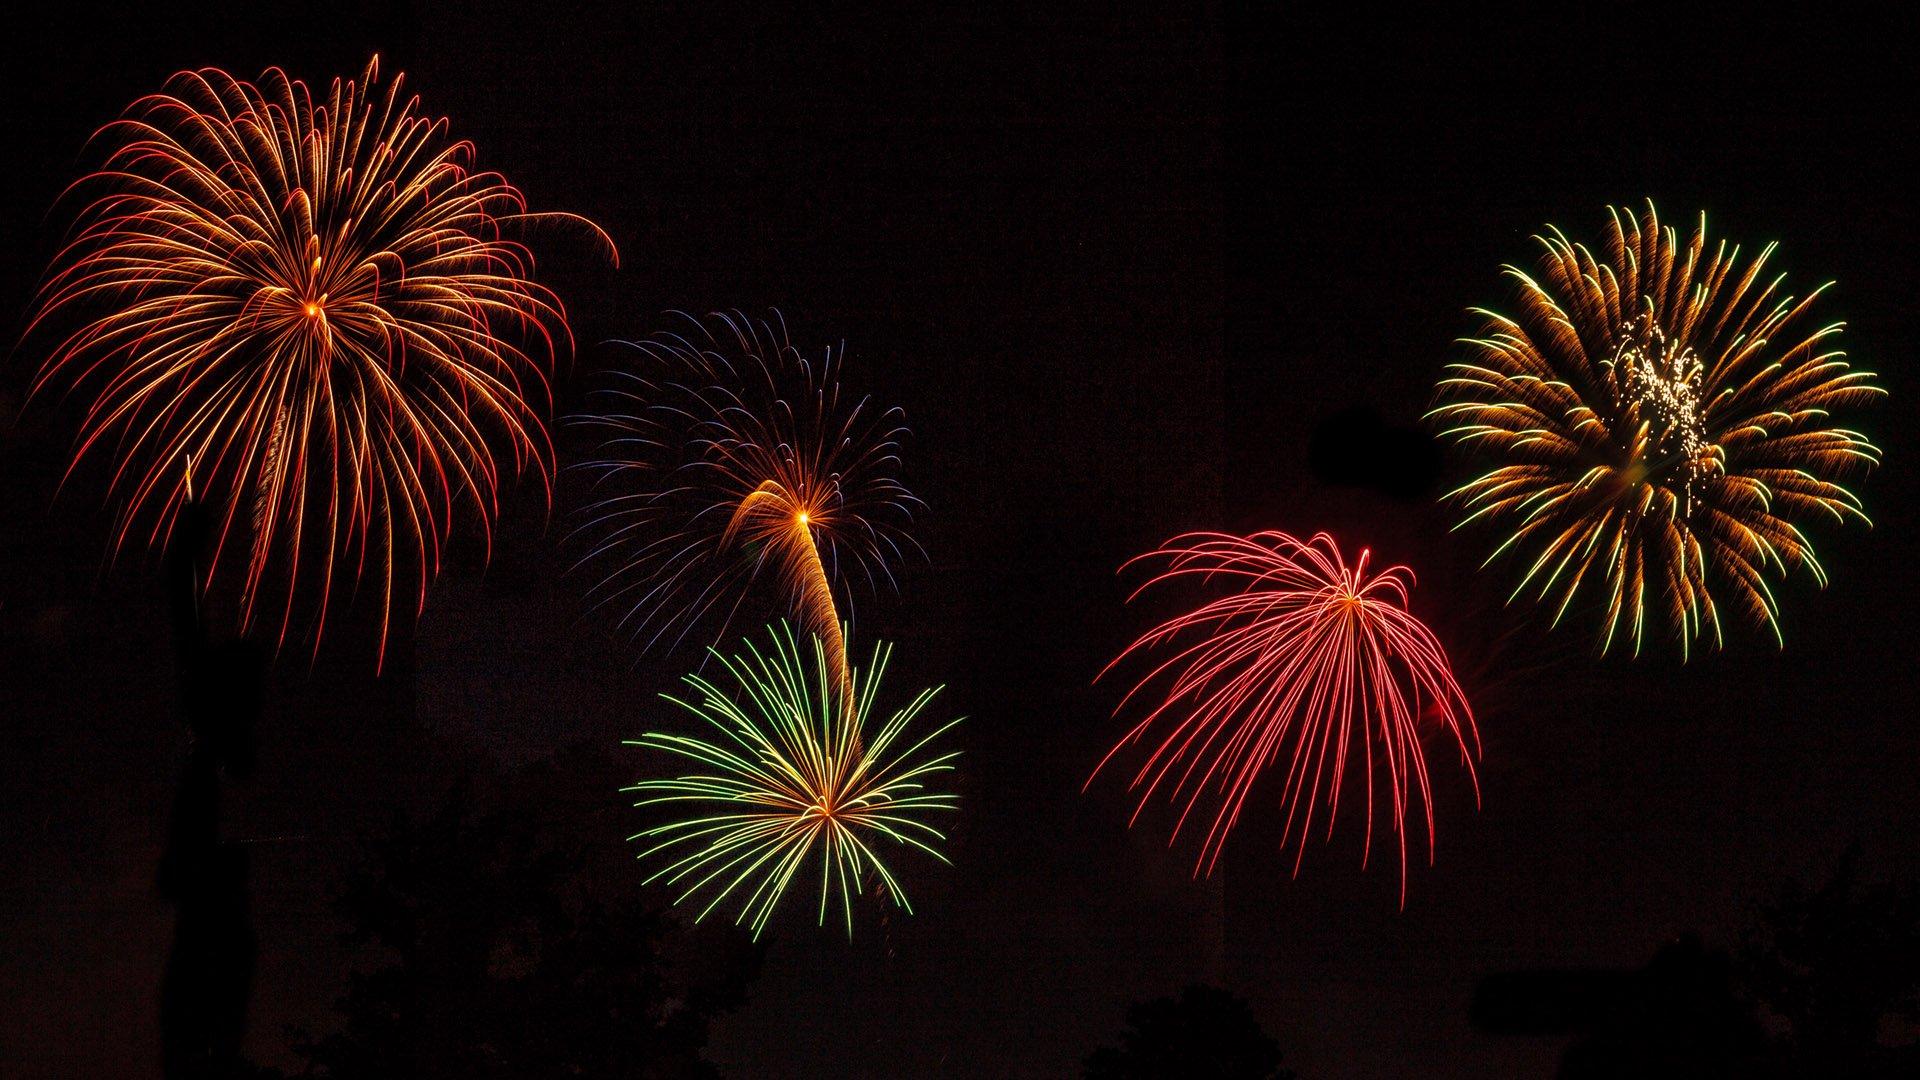 Finish Fireworks Photos in Lightroom! It's Easy   Photofocus